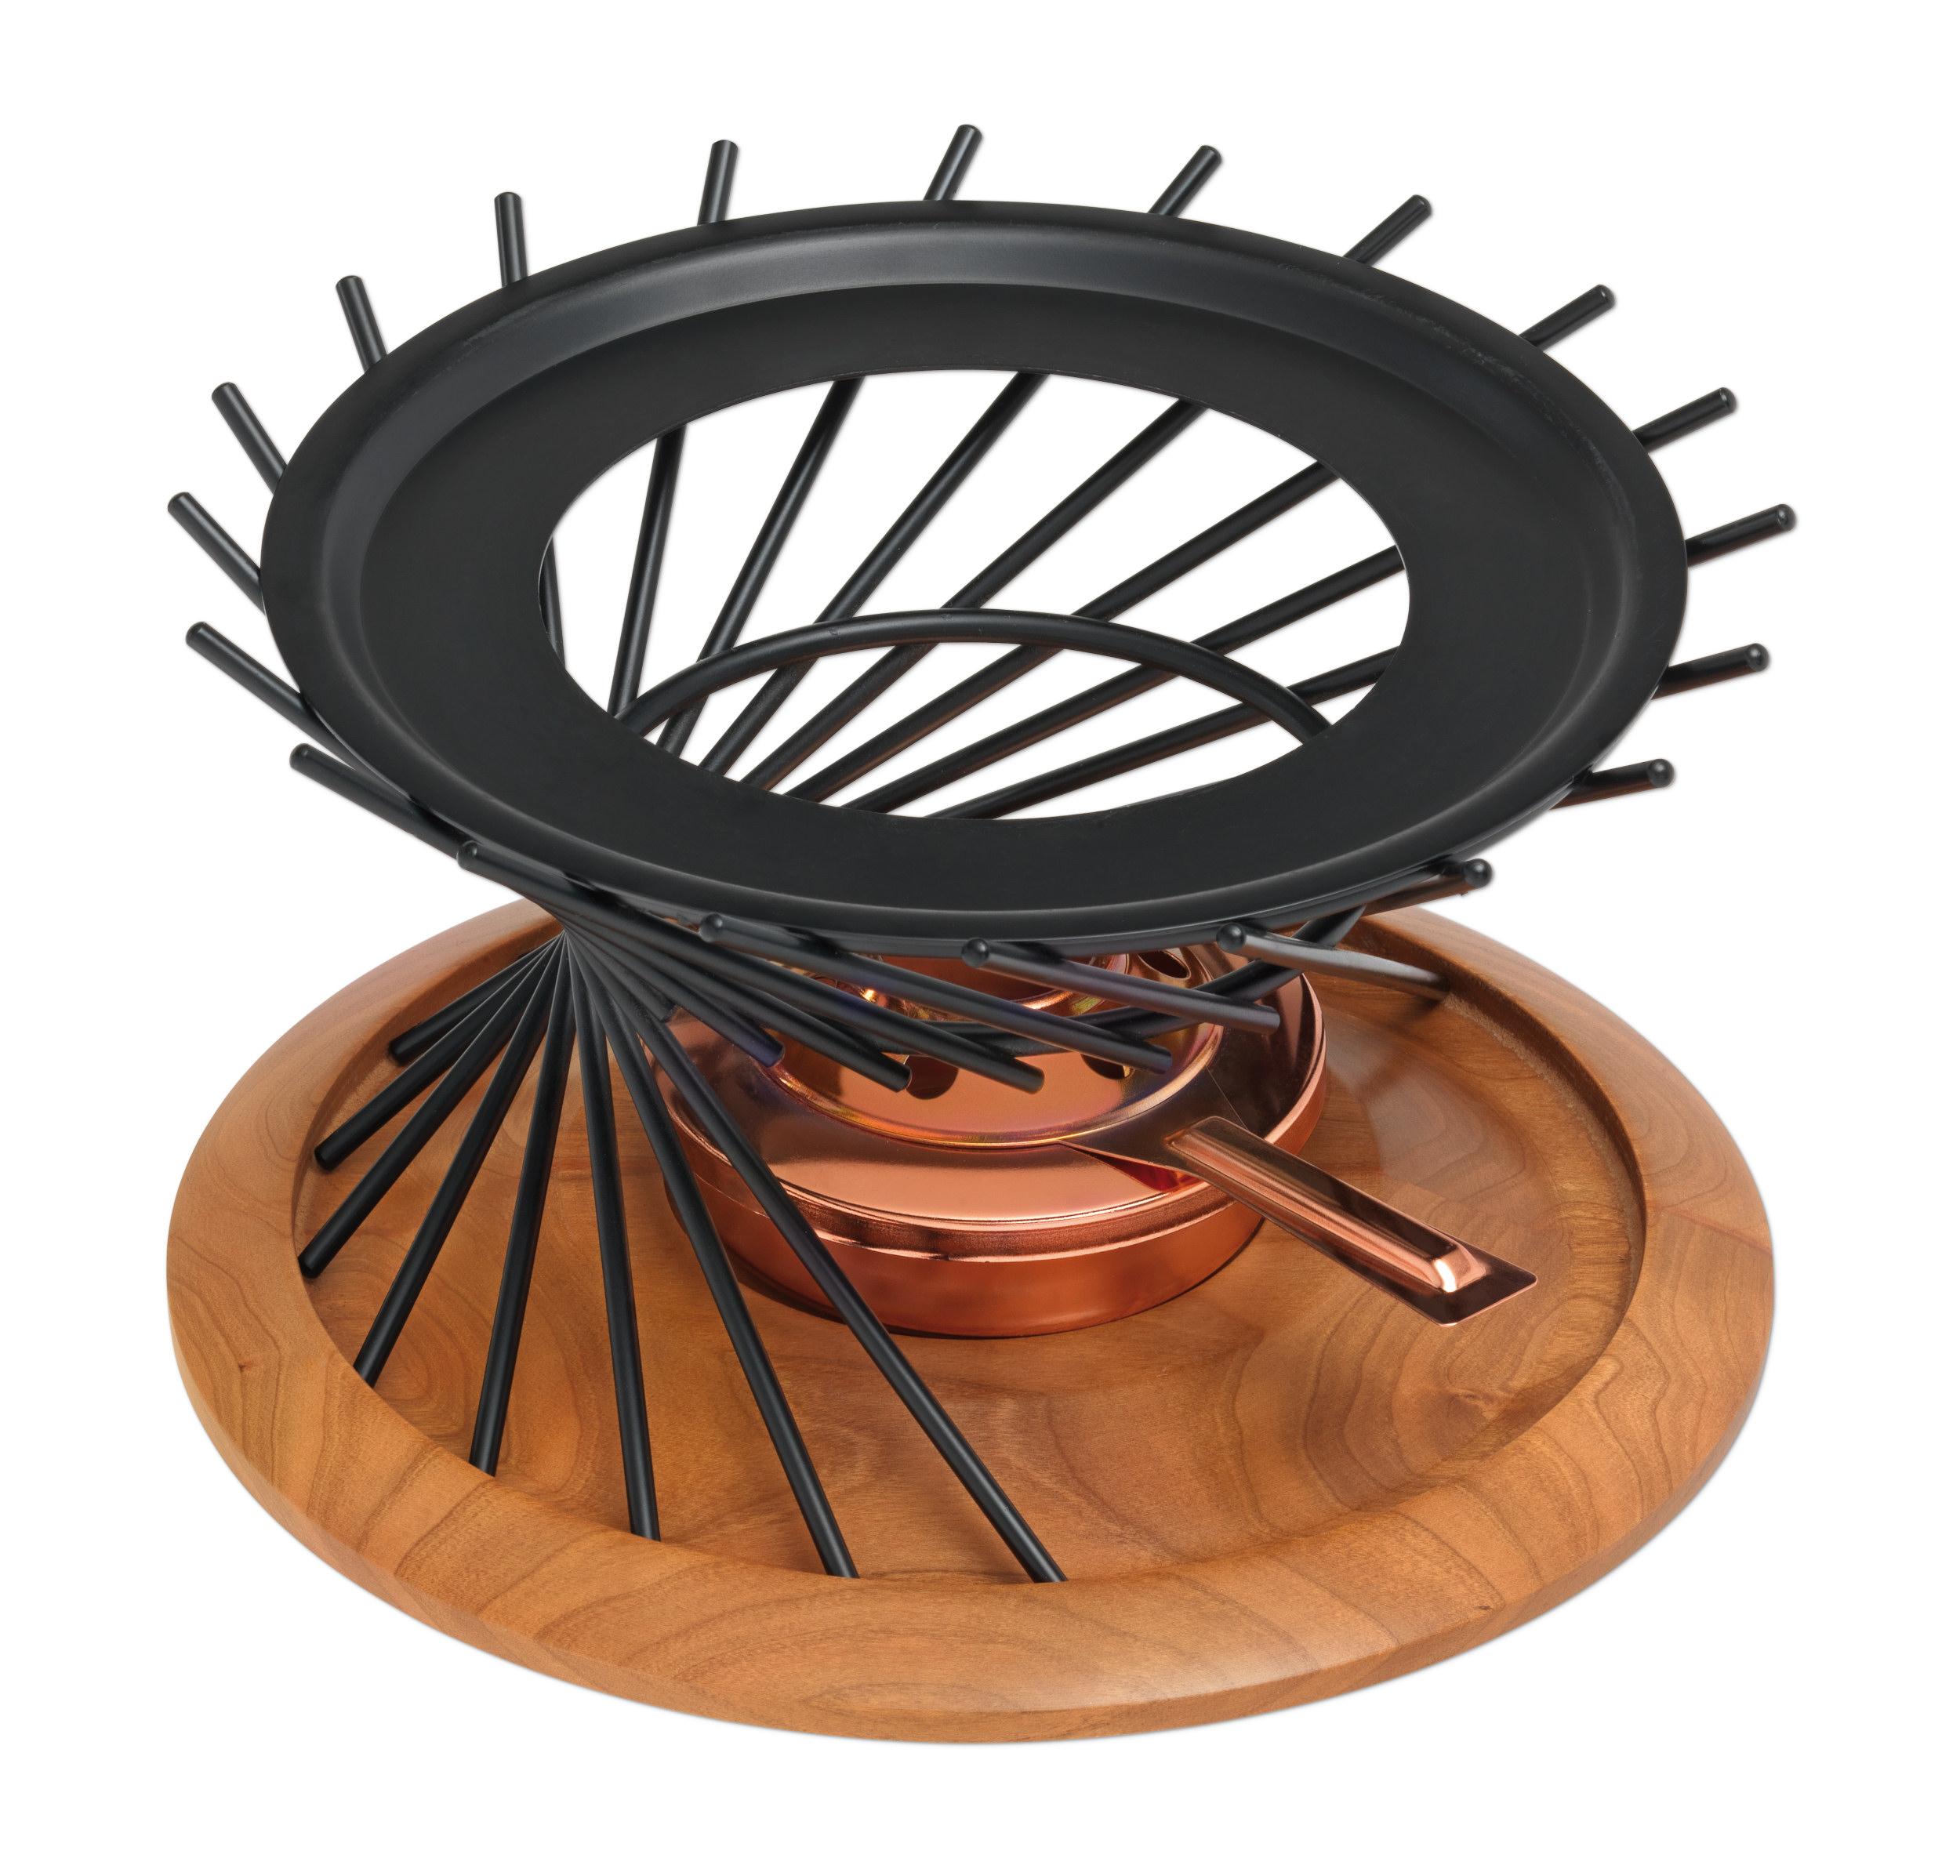 kuhn rikon rechaud vrin fondue rechauds. Black Bedroom Furniture Sets. Home Design Ideas